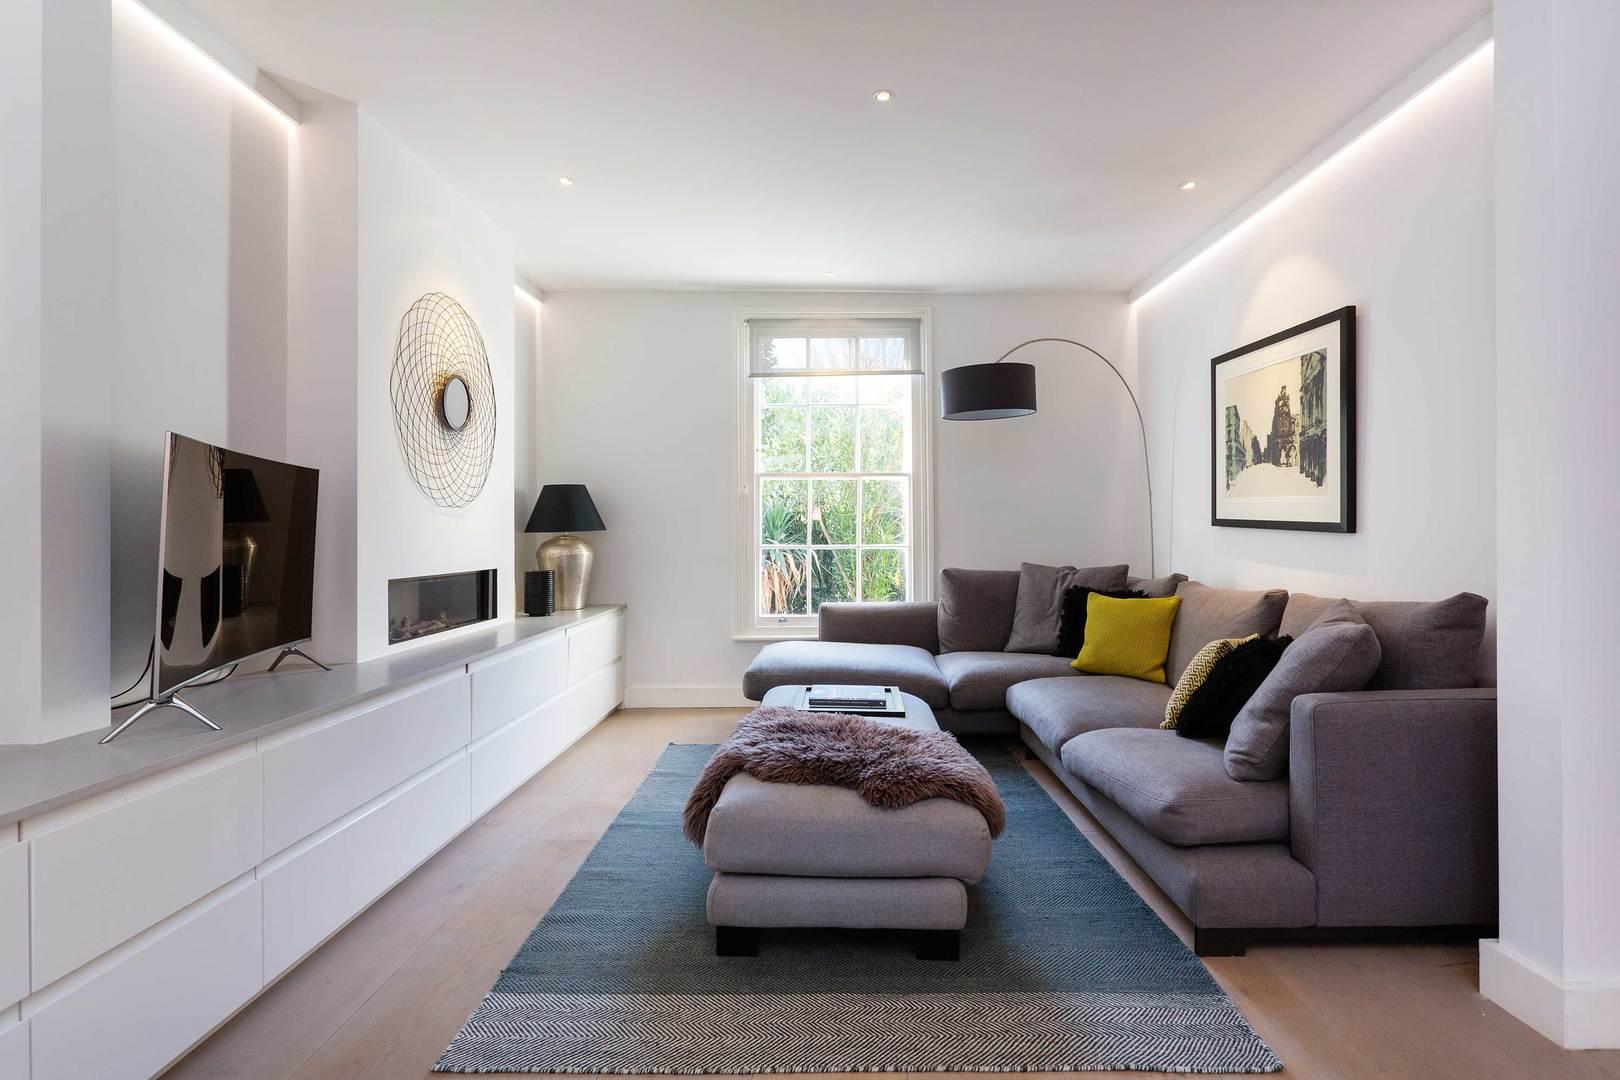 cubitt terrace retreat 2 bed house in clapham u2022 veeve rh veeve com